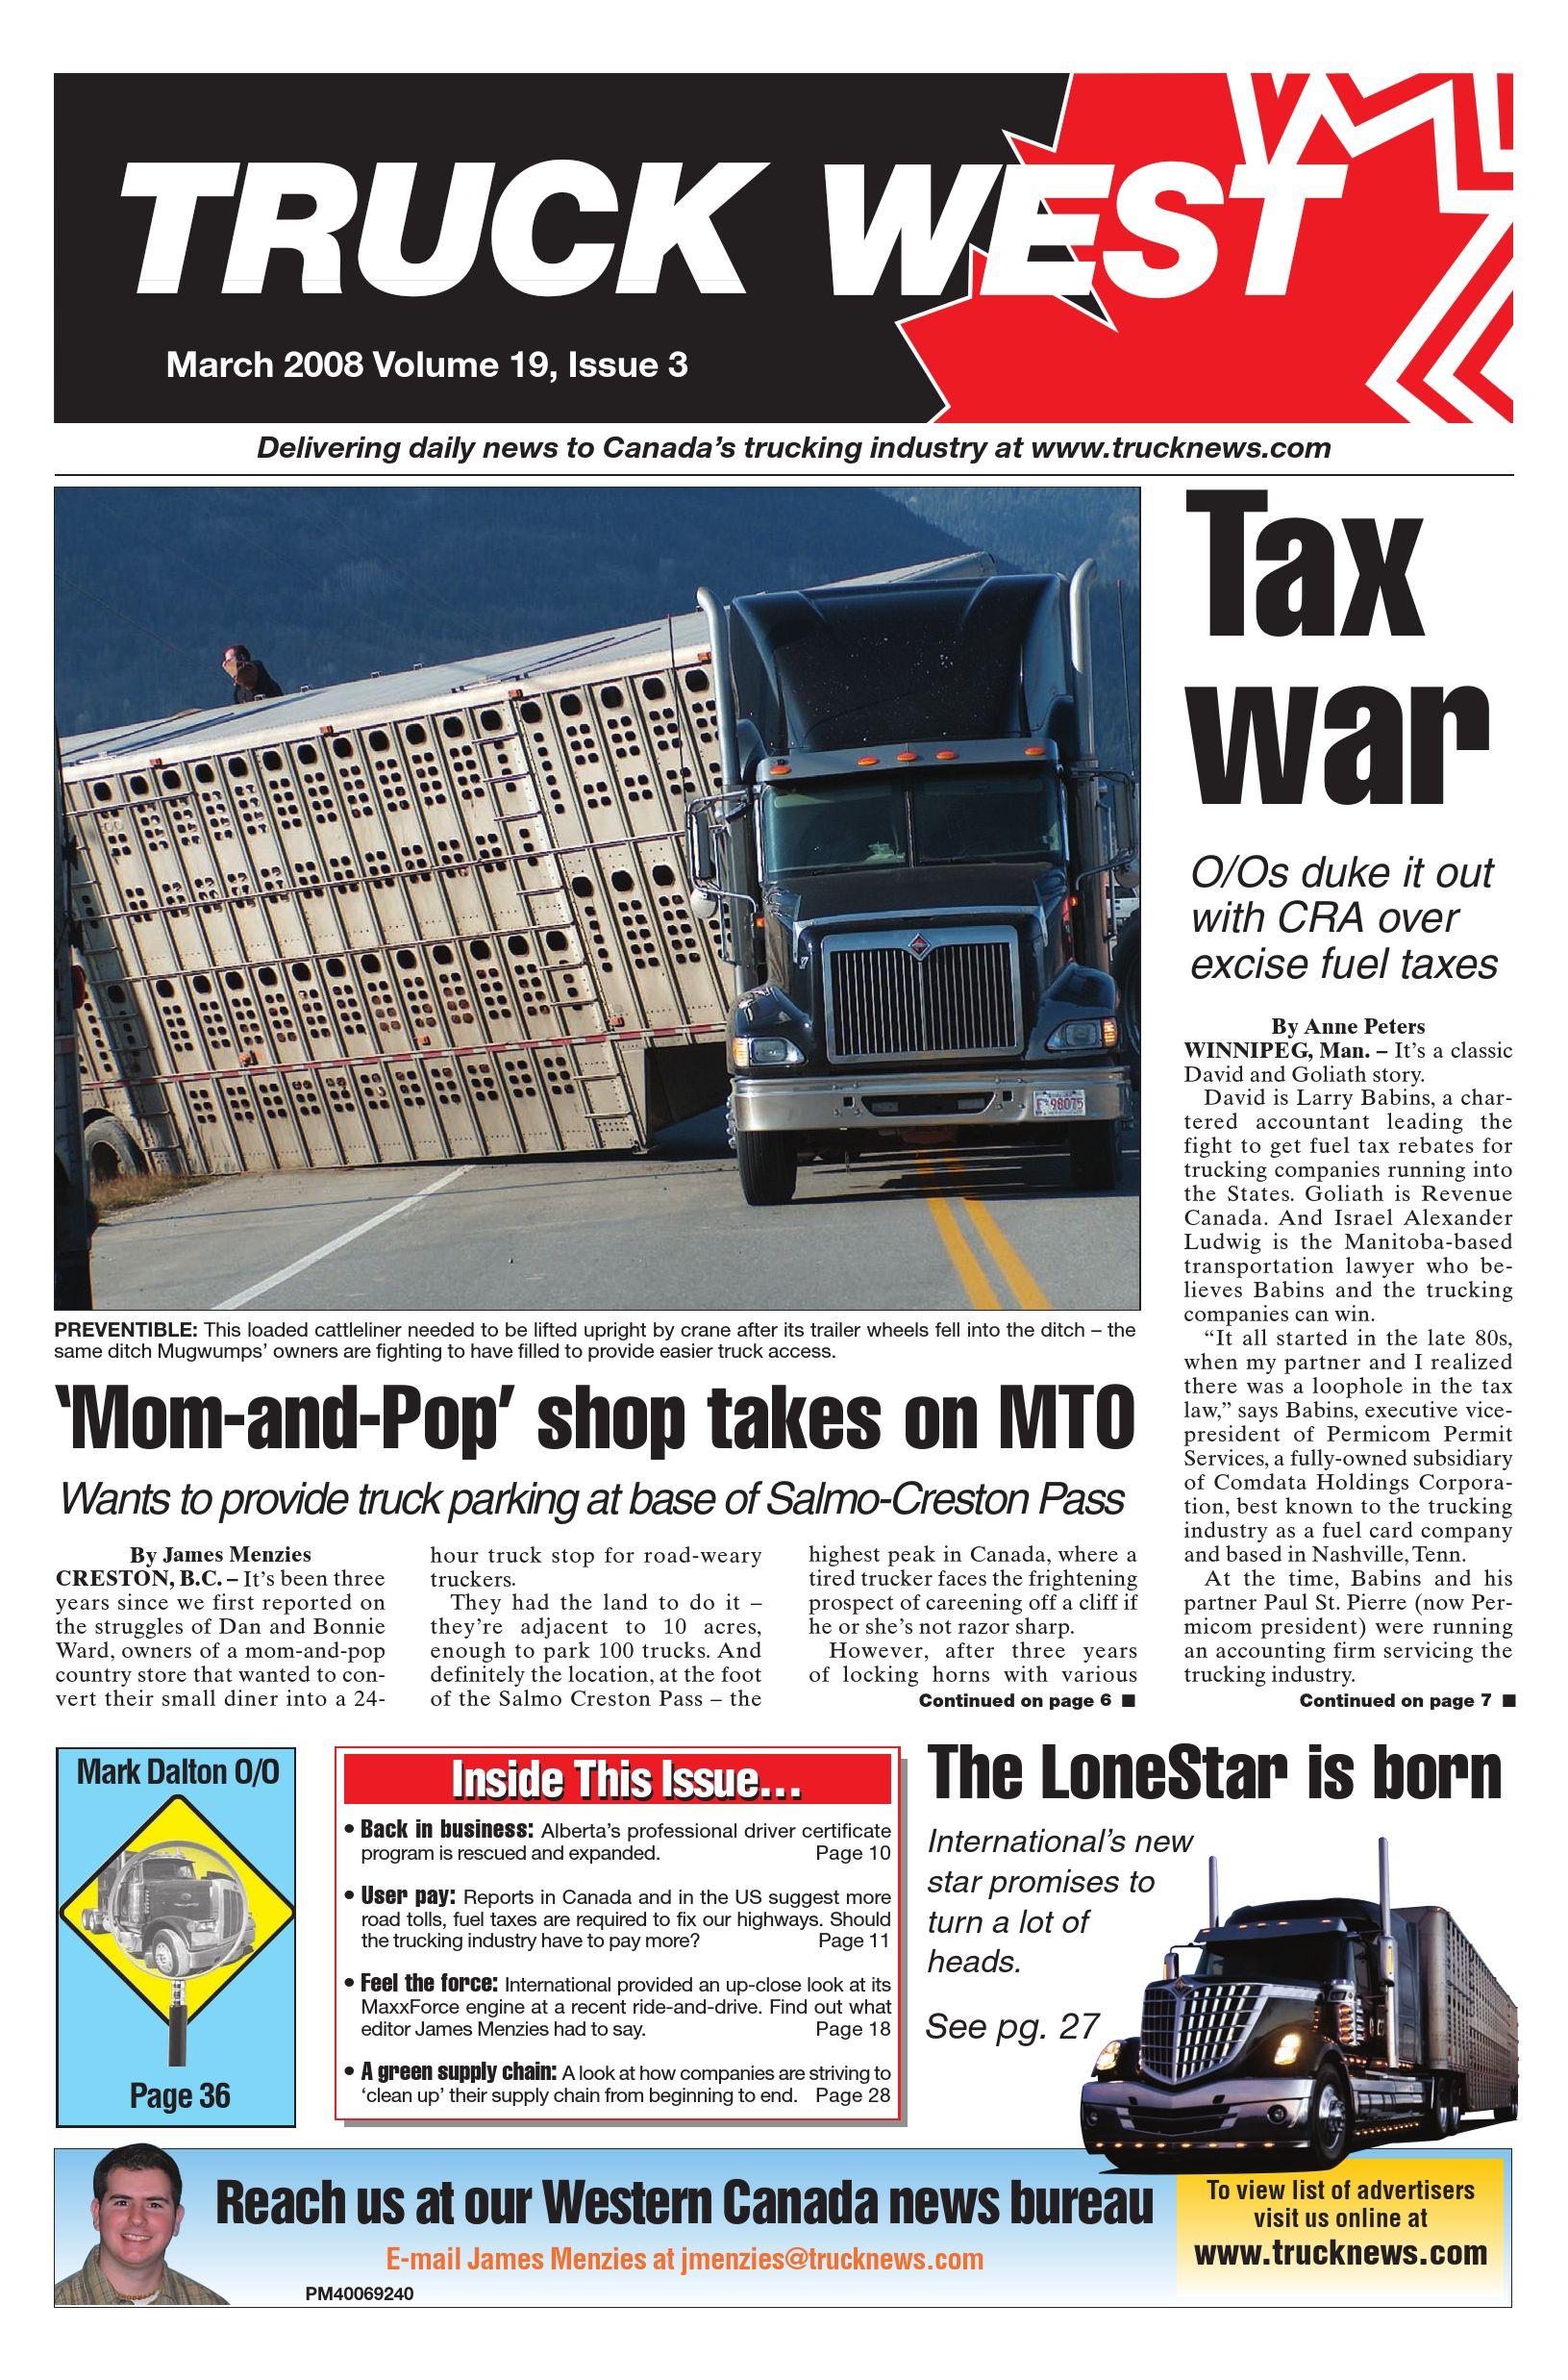 Truck News West – Mars 2008